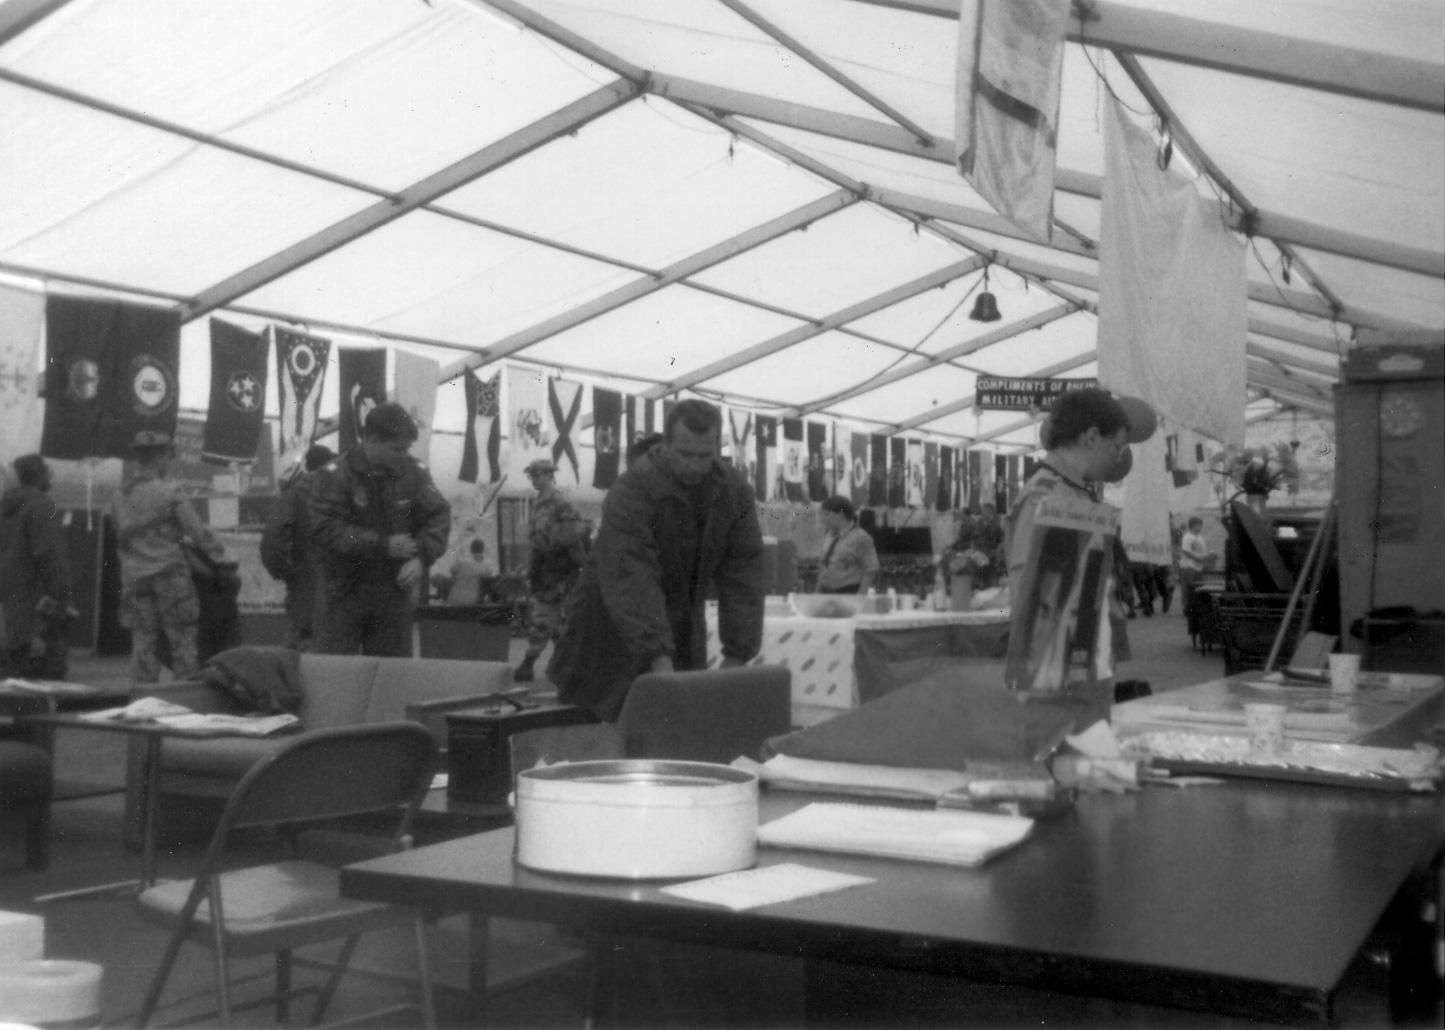 Tent City, 1991